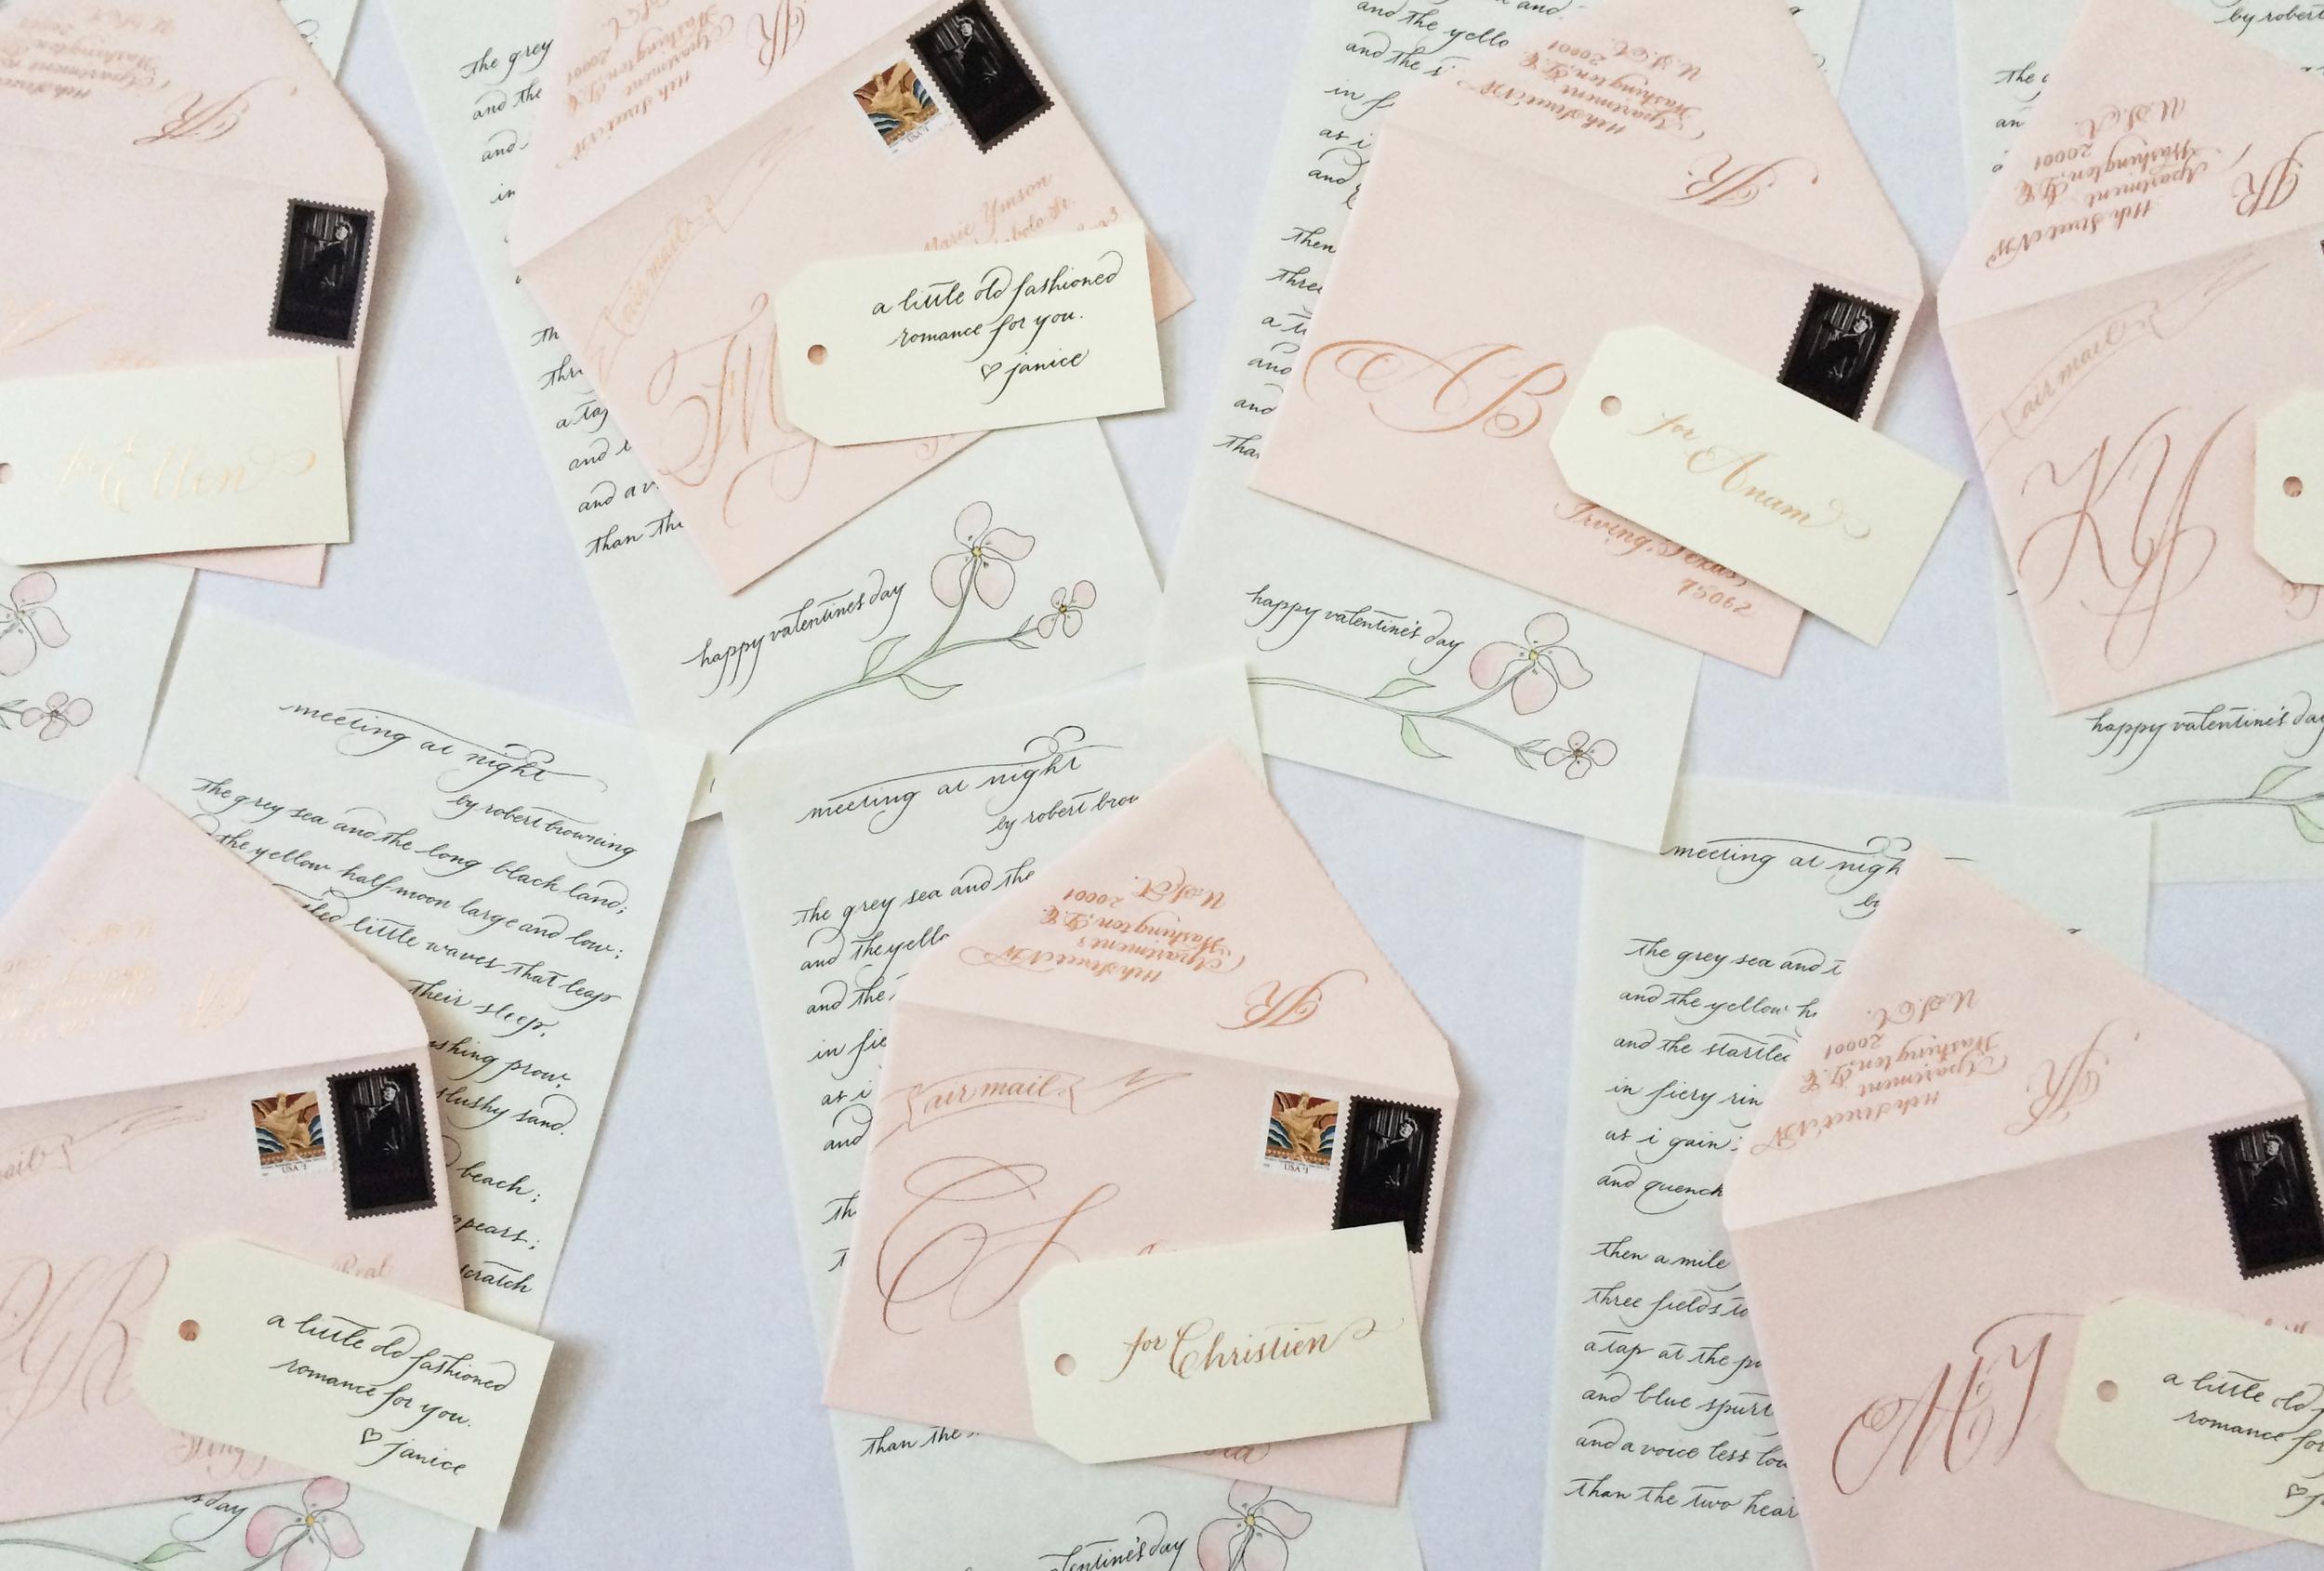 Meeting at Night , a poem   by Robert Browning and its accompanying envelopes.